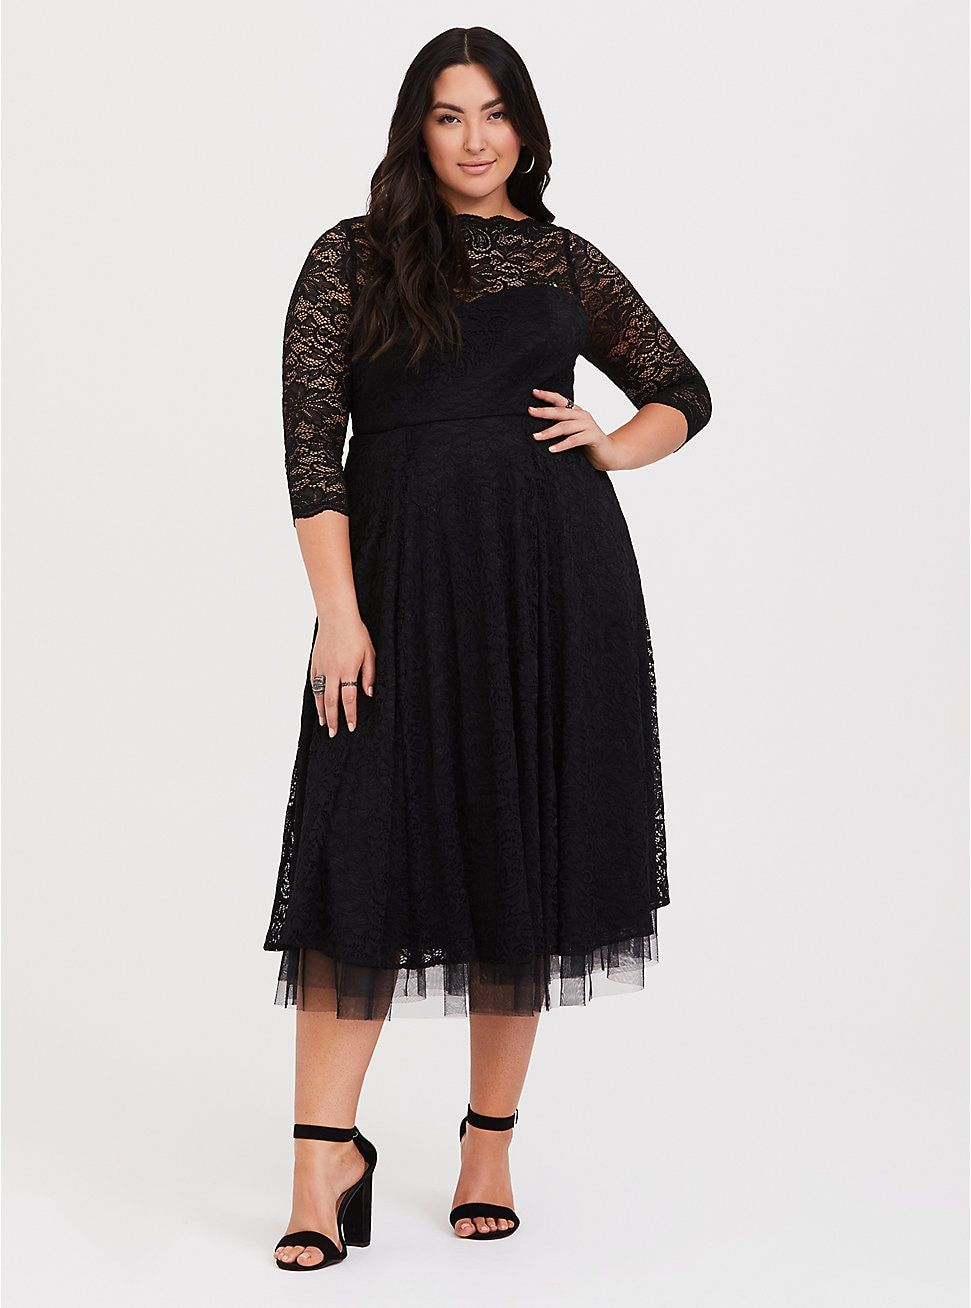 Plus Size Special Occassion Black Lace Midi Dress Deep